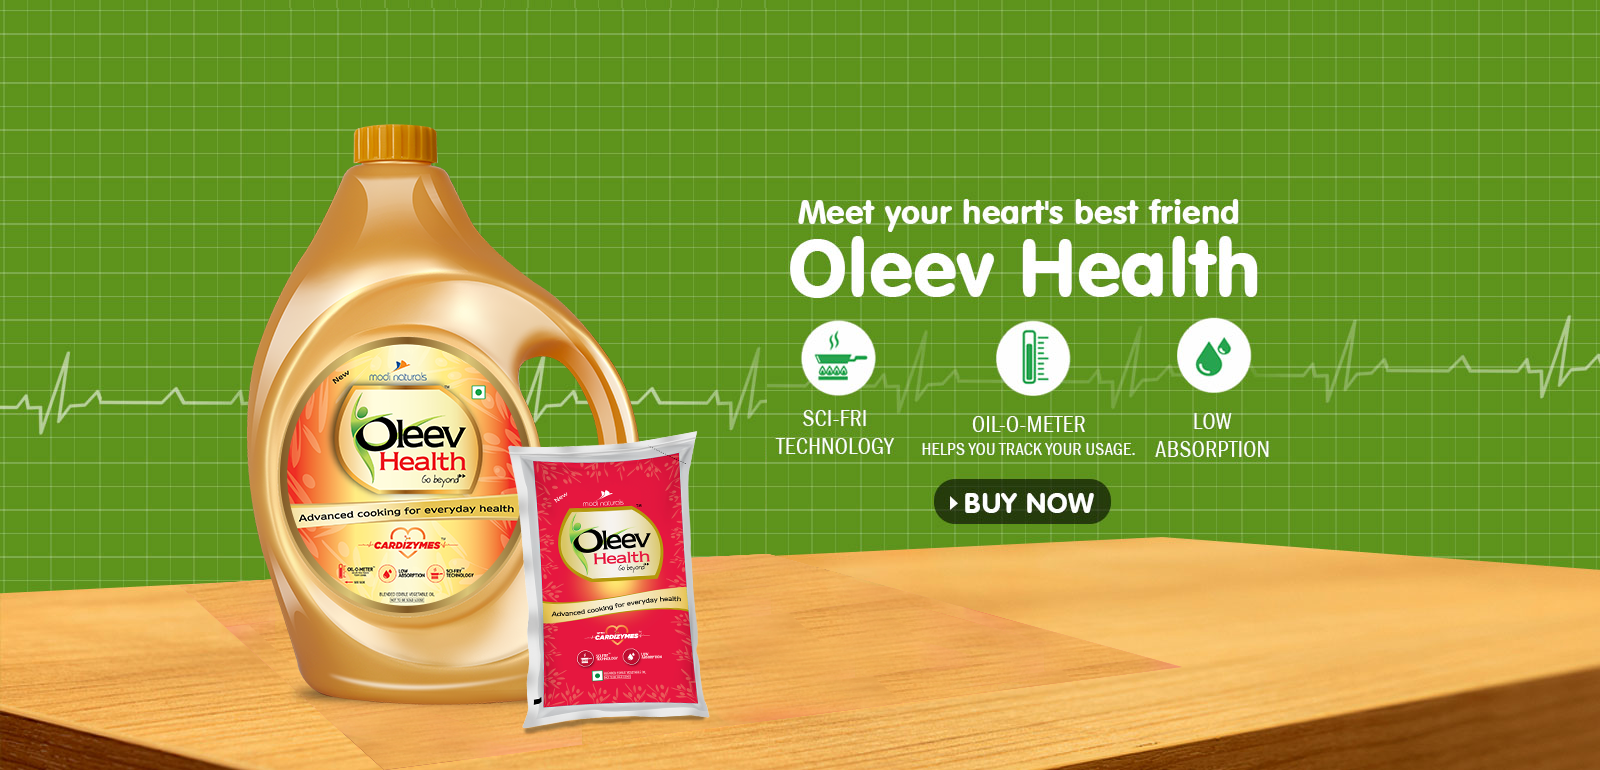 oleev-health-banner